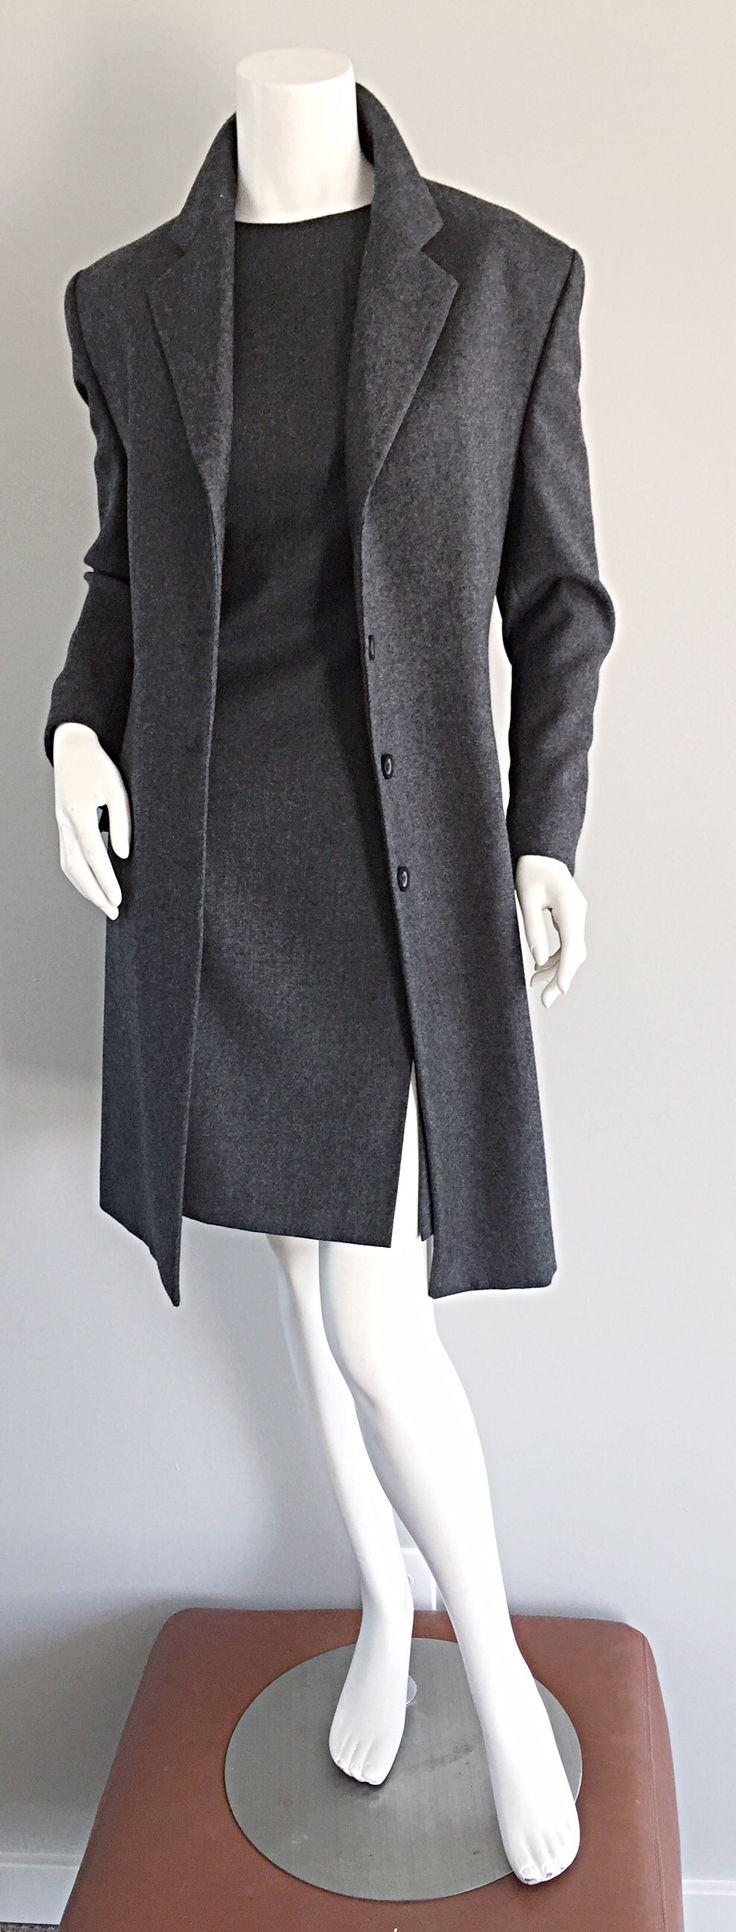 1990s Max Mara ' Woolmark ' Classic Charcoal Grey Dress + Jacket Ensemble